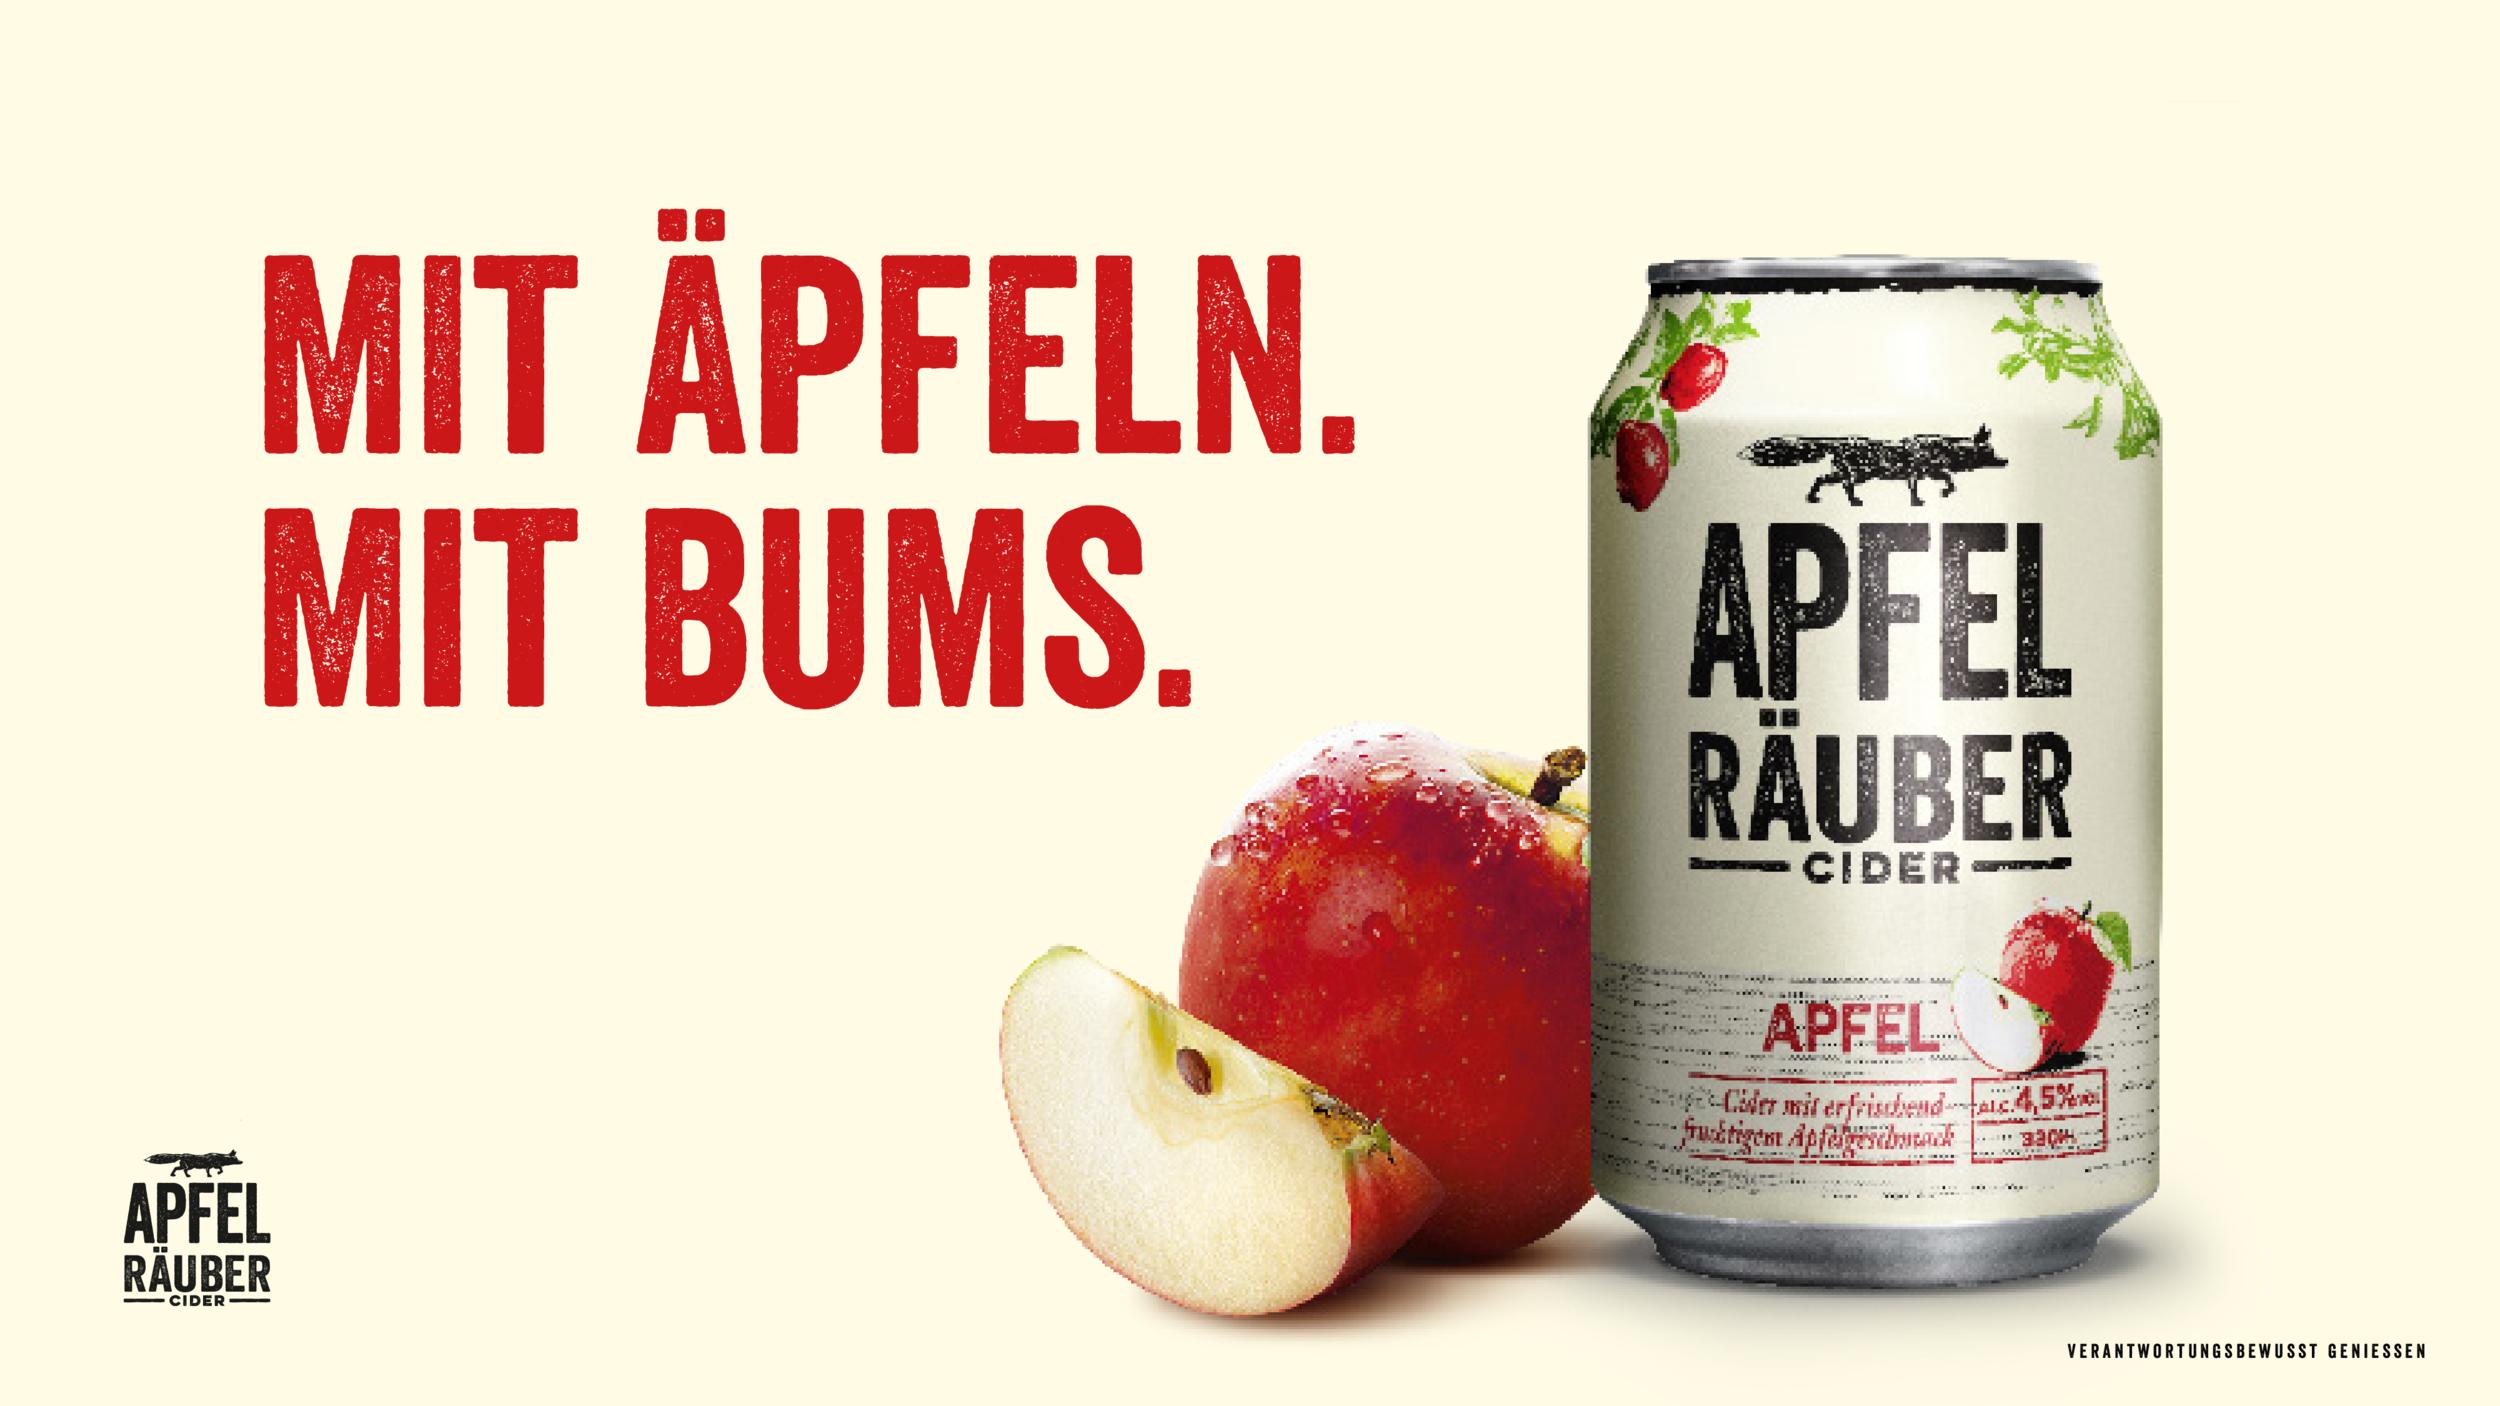 Apfel Räuber Cider - Building a lifestyle brand for Generation Z